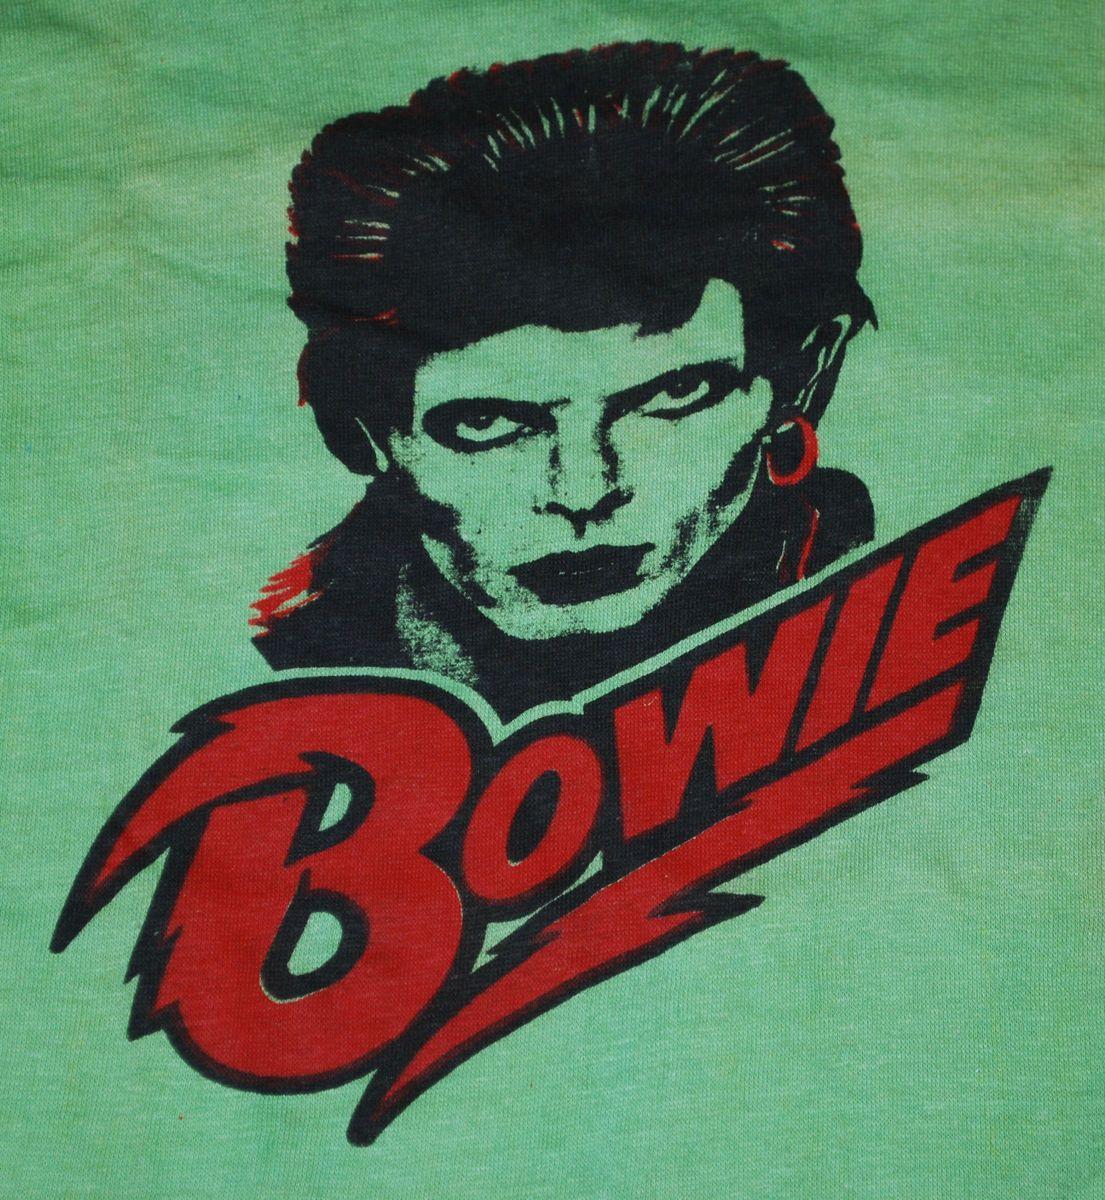 VINTAGE DAVID BOWIE T SHIRT 1970S L ORIGINAL VTG ROCK N ROLL TEE